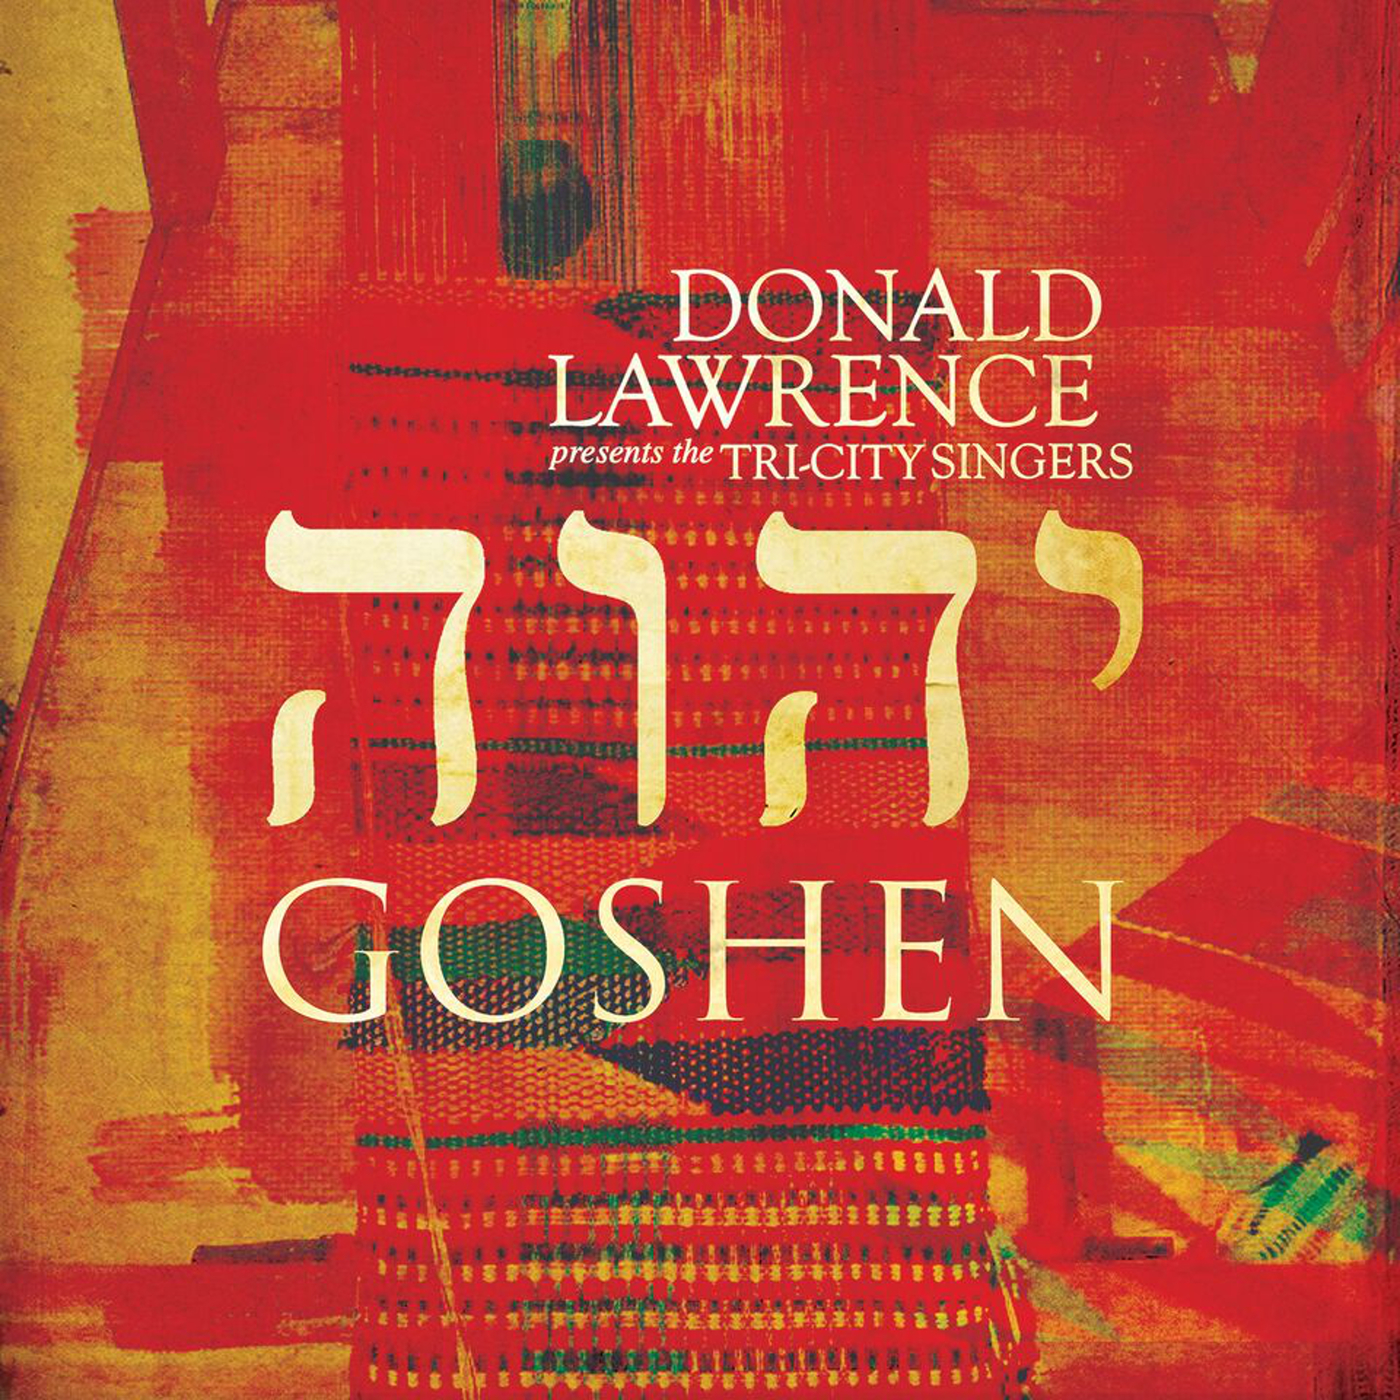 Goshen - Donald Lawrence